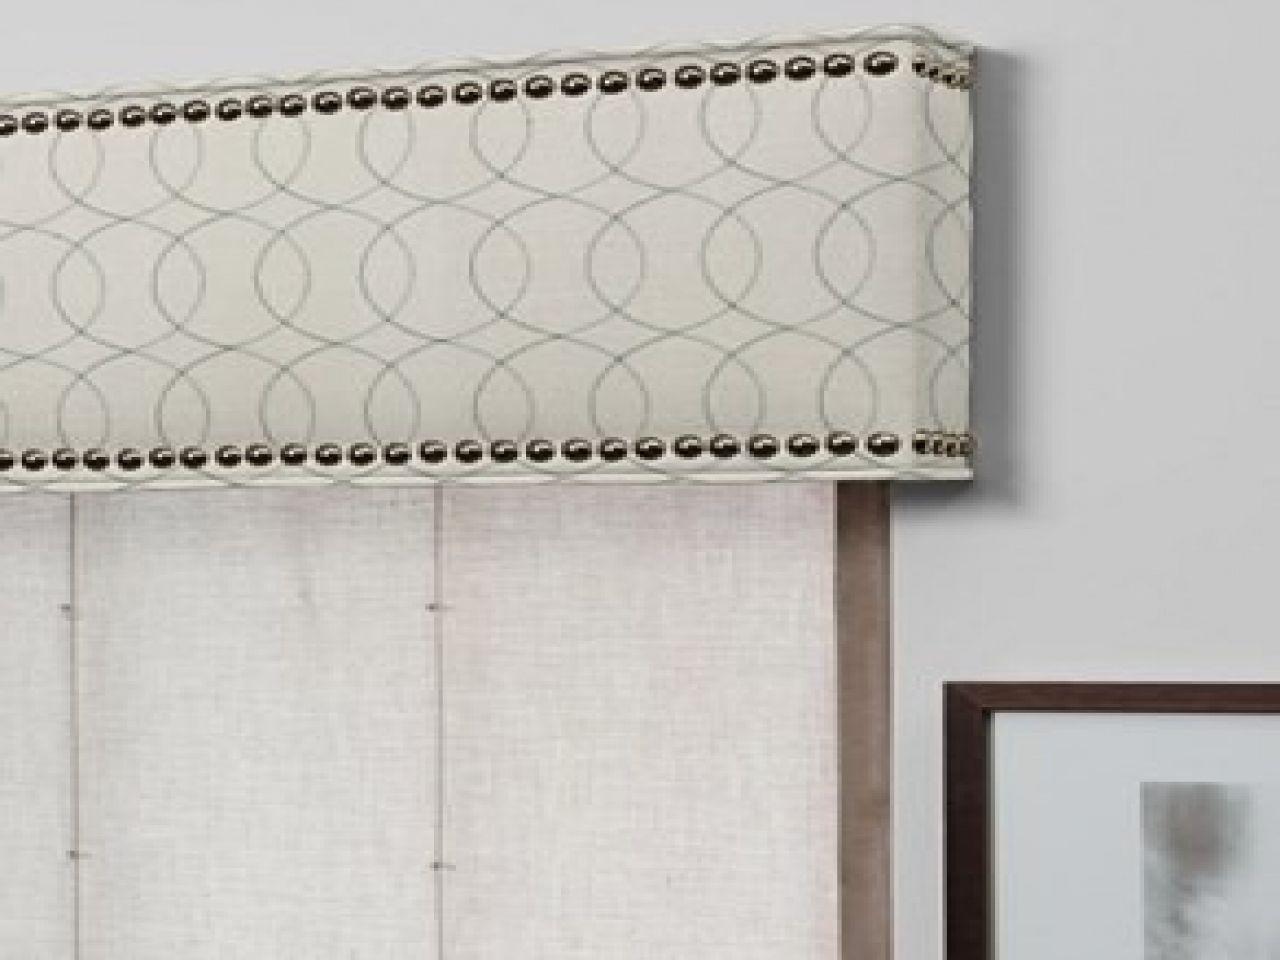 Cornice Board Window Treatments Madison Art Center Design